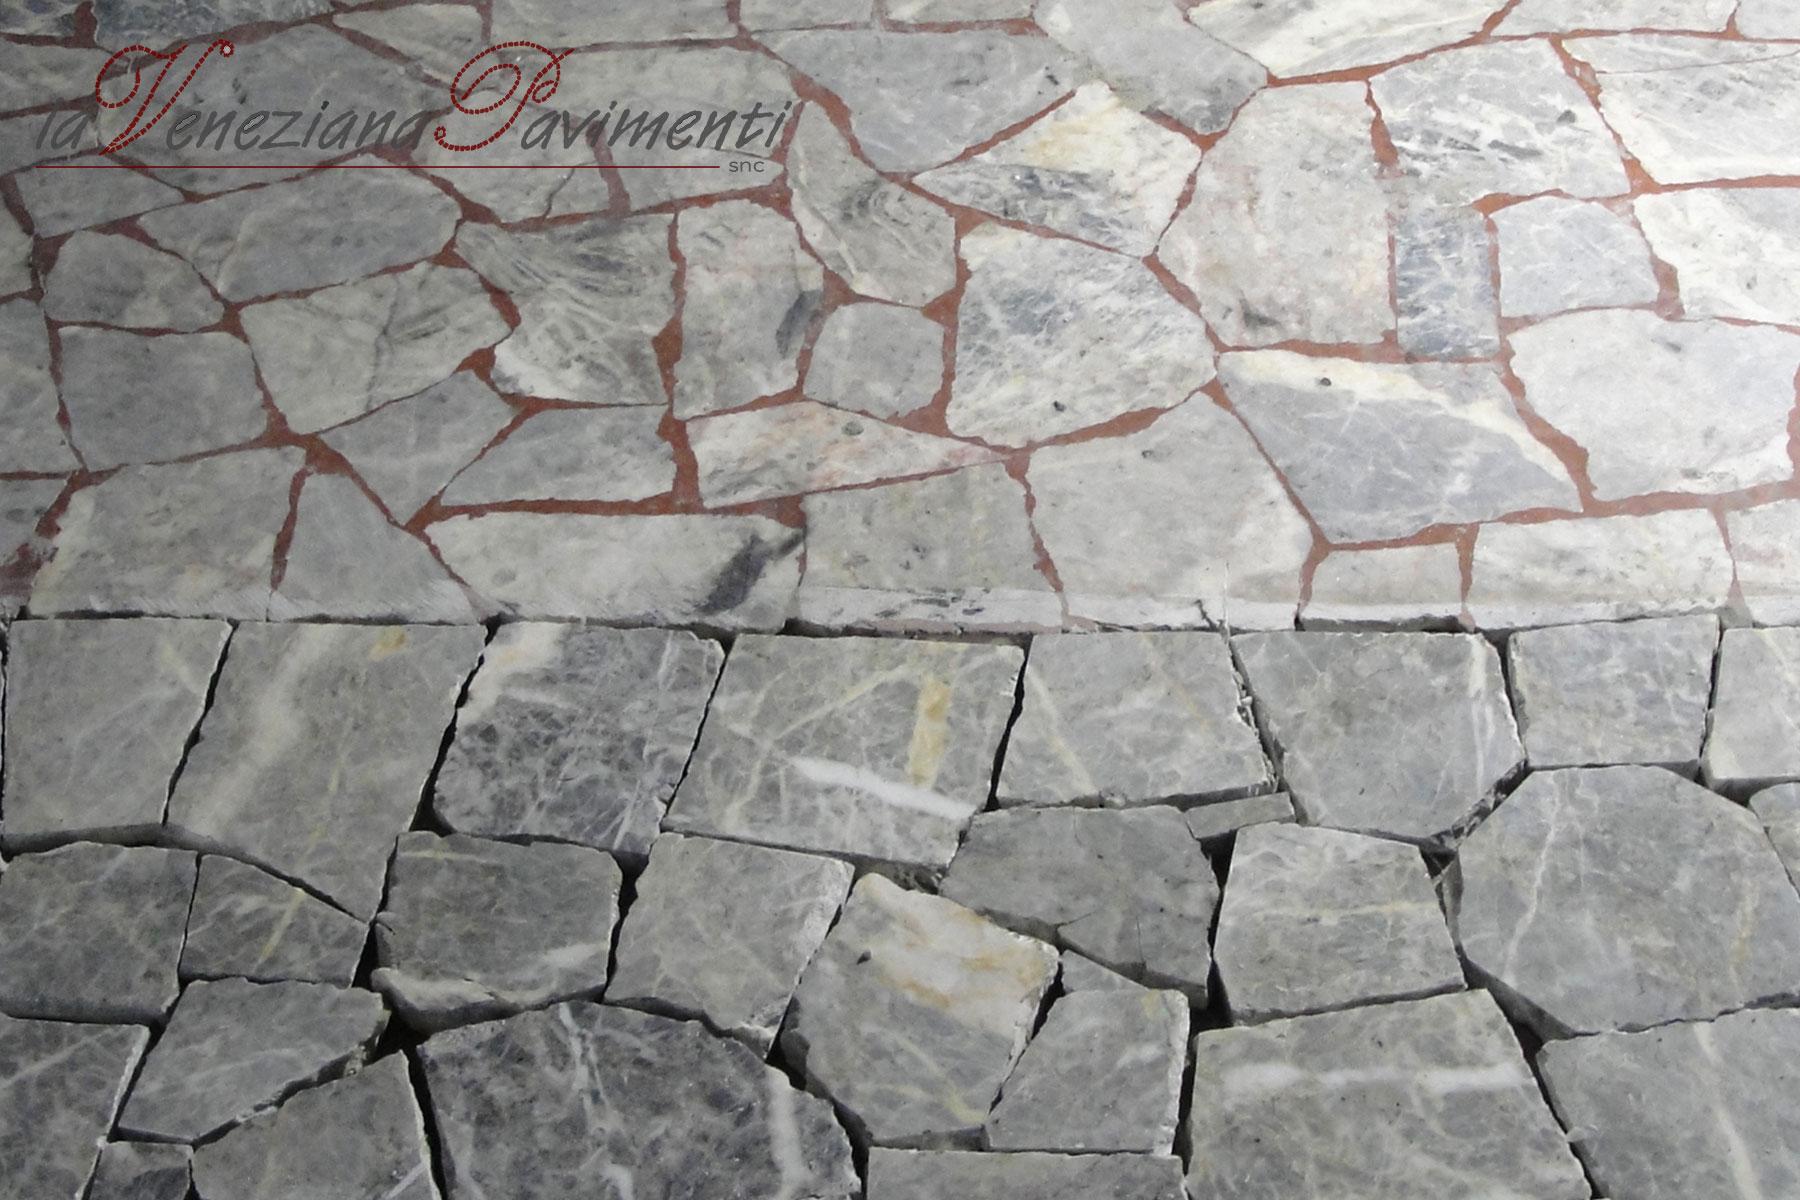 Pavimento Alla Palladiana.Pavimento Alla Veneziana Vicenza Padova Verona La